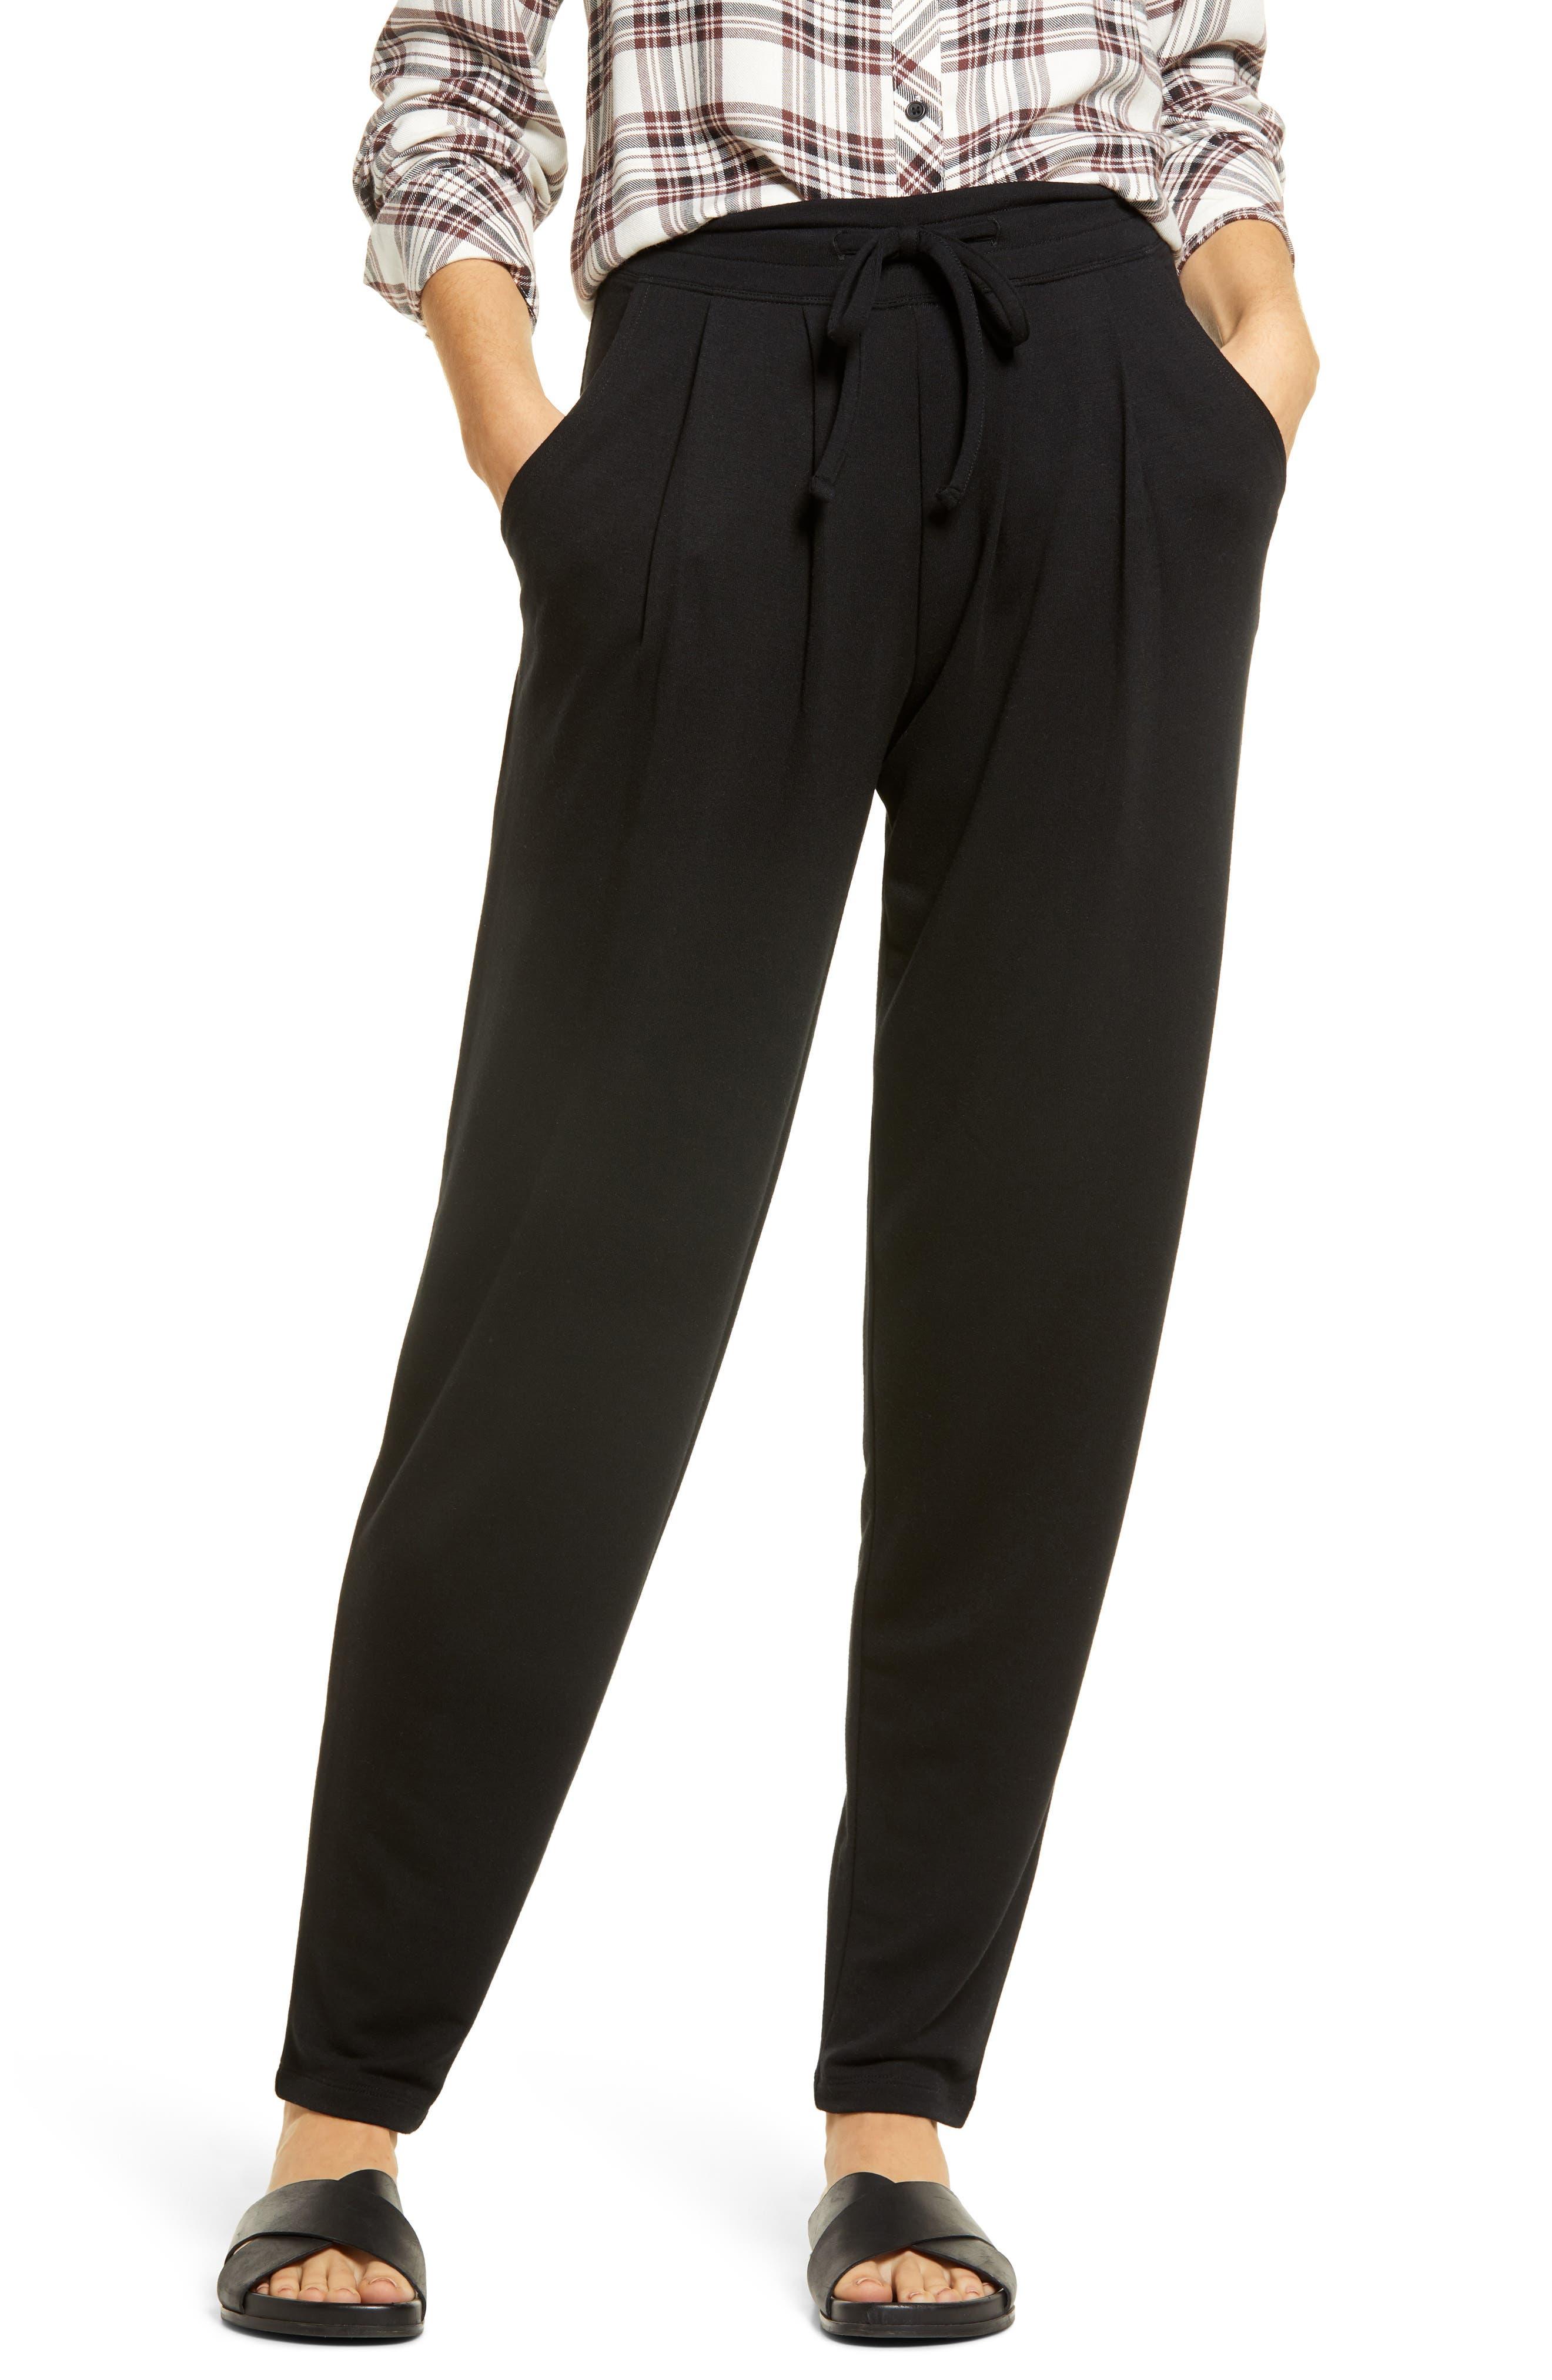 Wearever Curbside Pleated Drawstring Pants